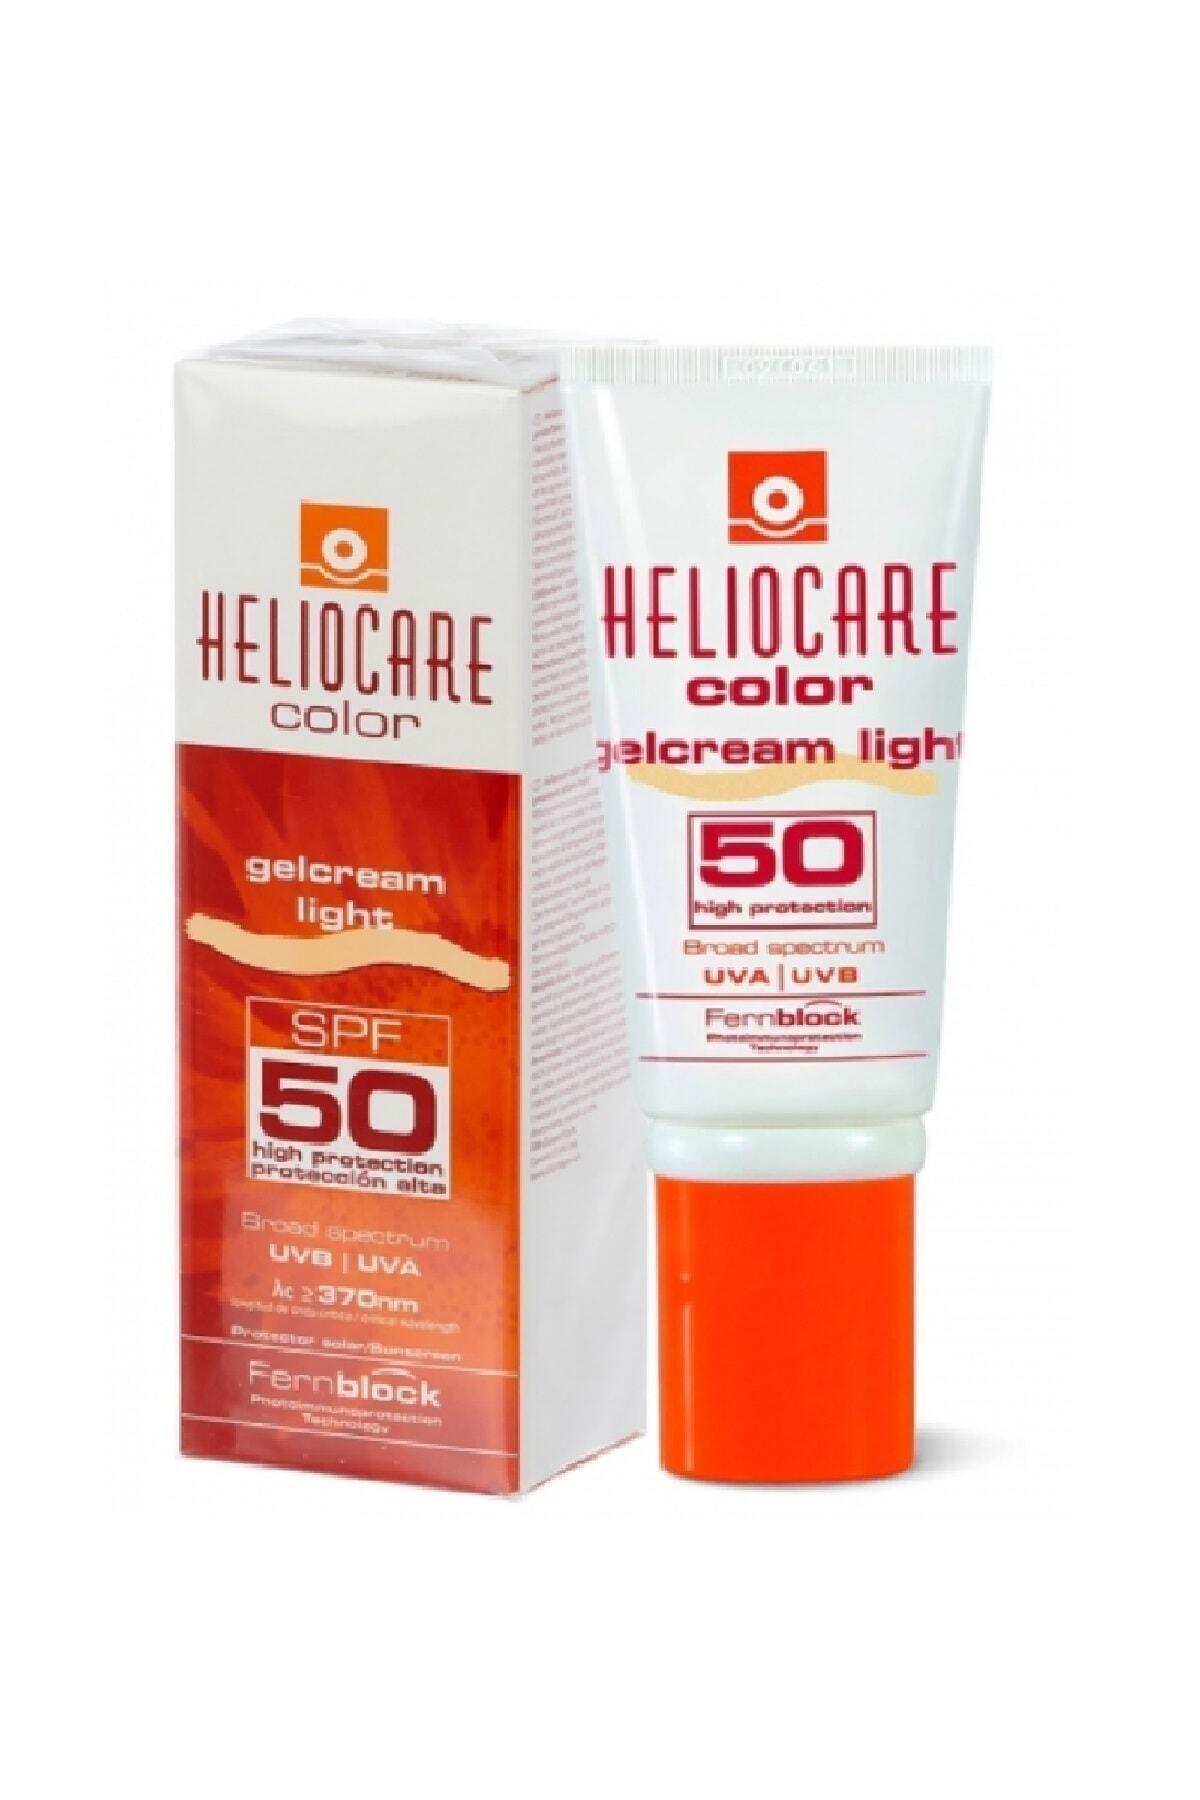 Heliocare Colo Spf 50 Gelcream Light 50ml 1